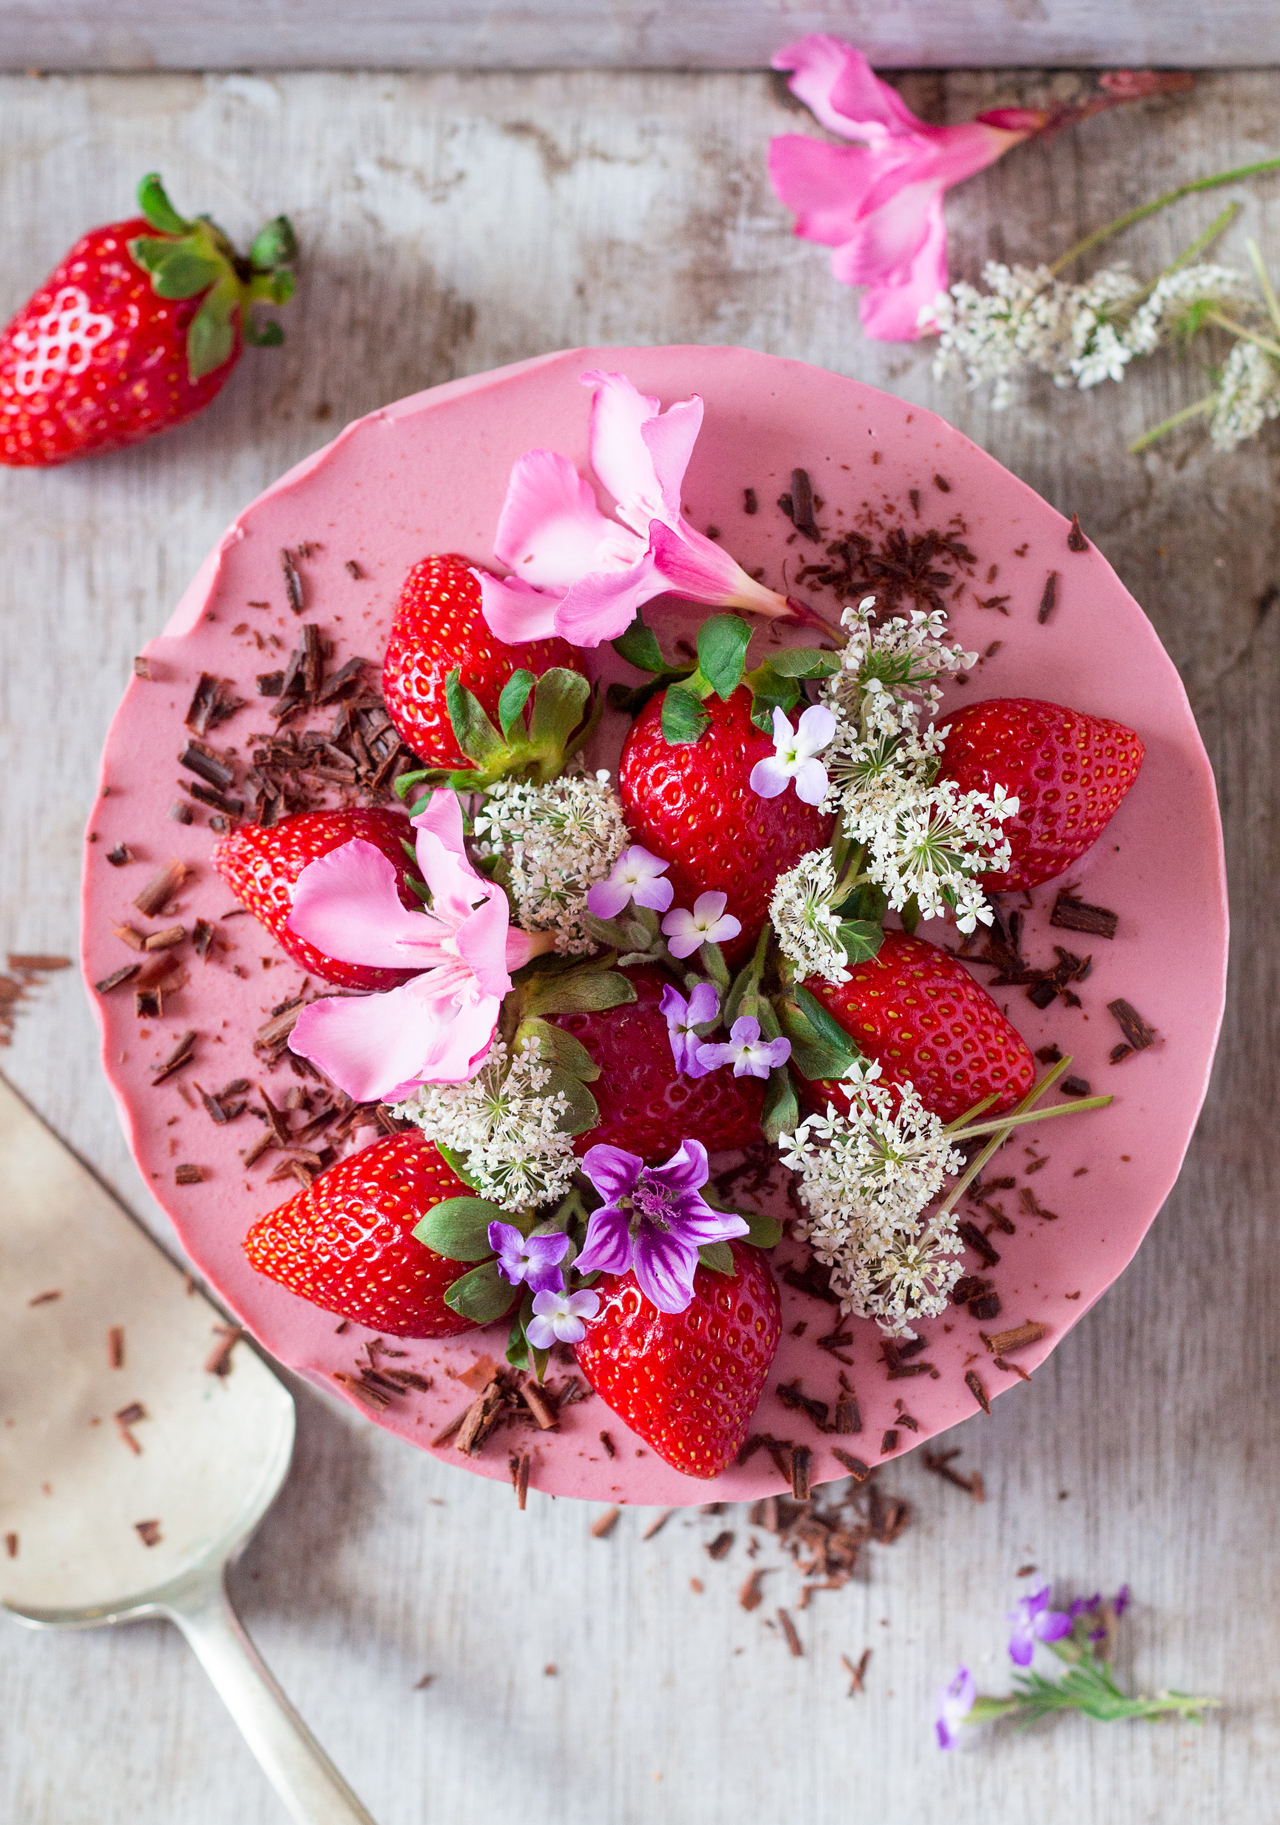 Vegan Strawberry Cheesecake Oil Free Lazy Cat Kitchen